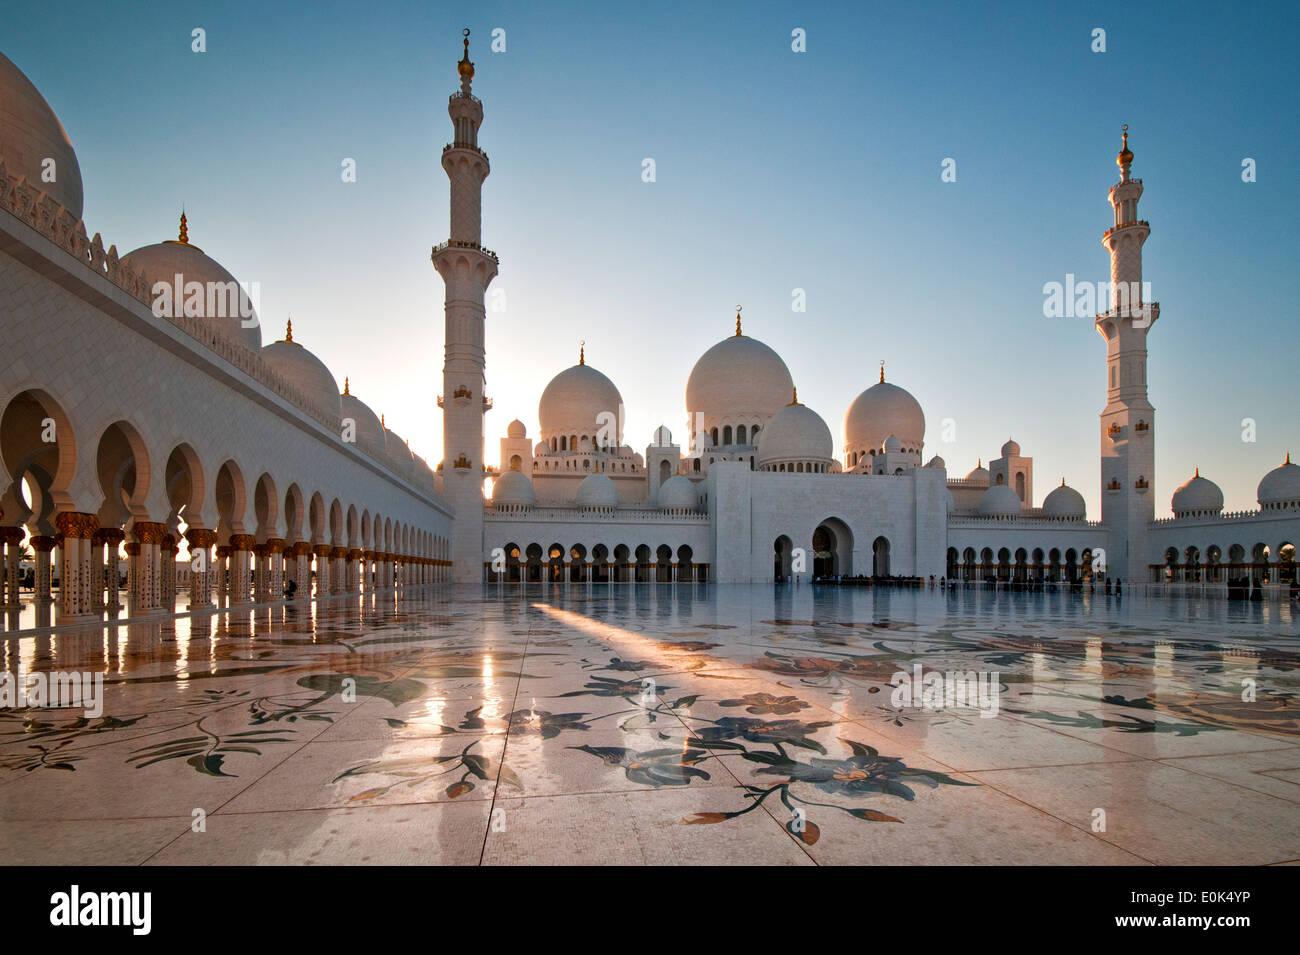 The Sheikh Zayed Grand Mosque at Sunset, Abu Dhabi, United Arab Emirates, Middle East - Stock Image